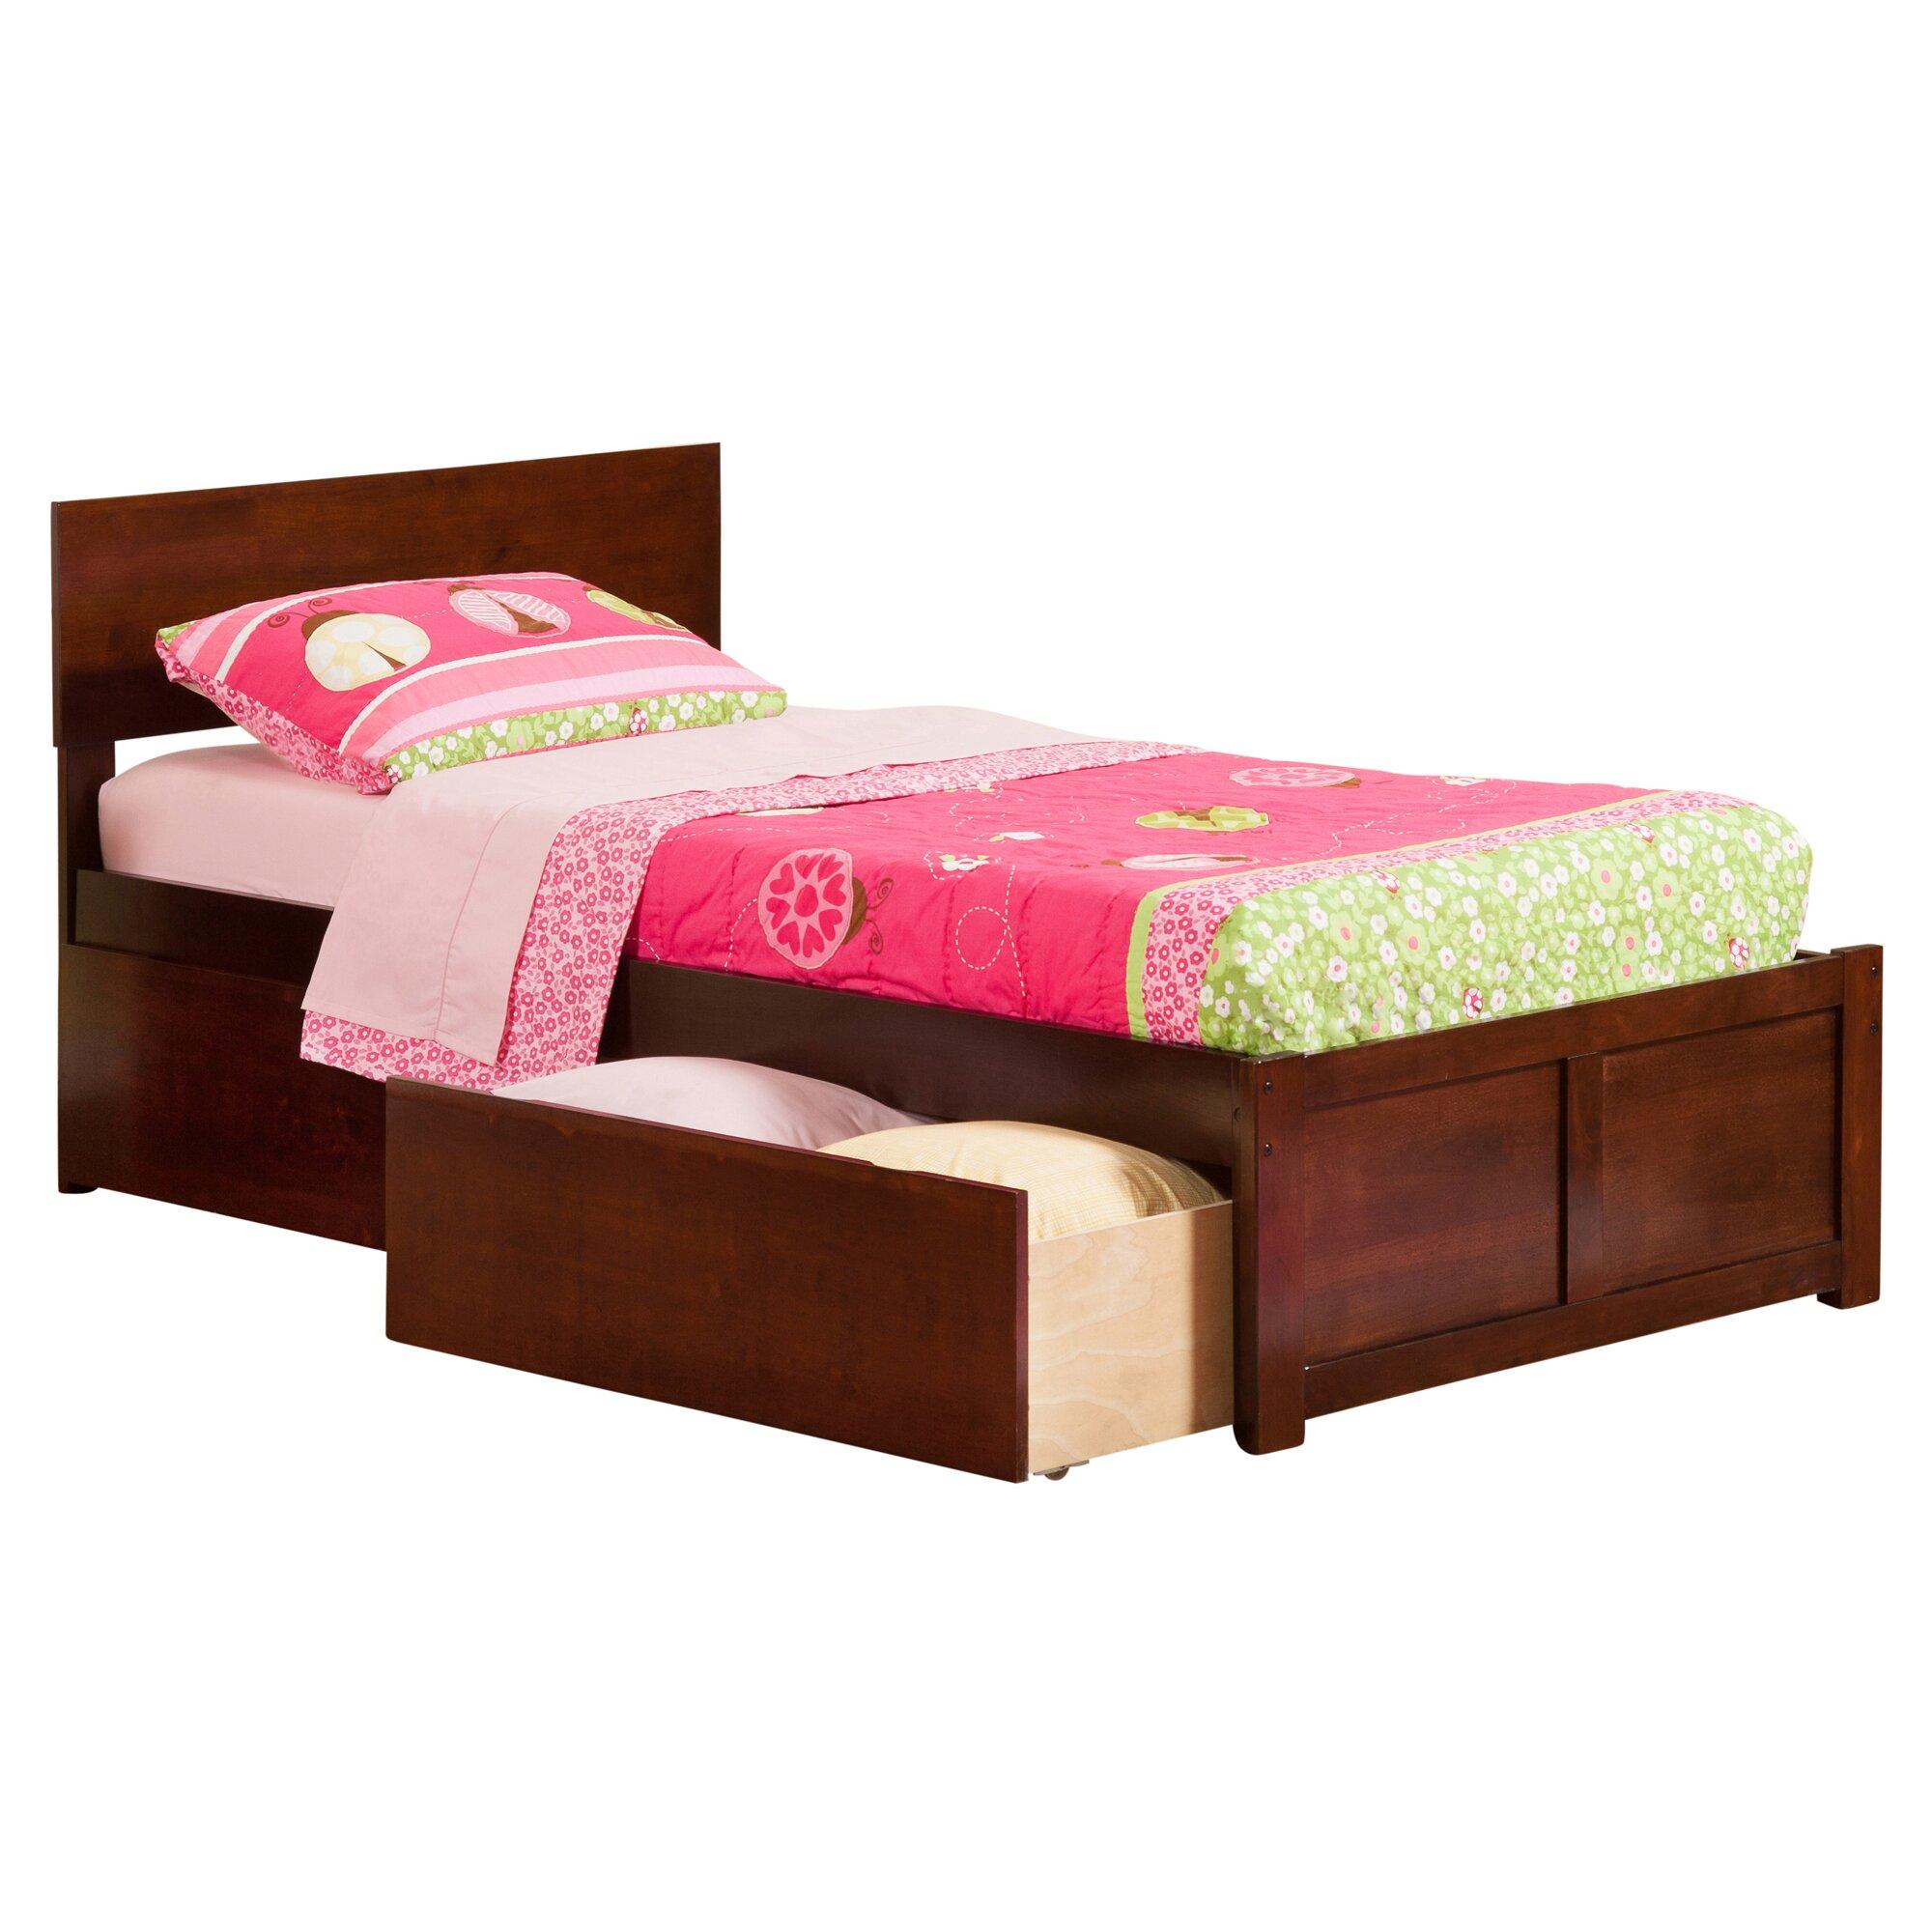 Viv Rae Mathias Extra Long Twin Panel Bed With Storage